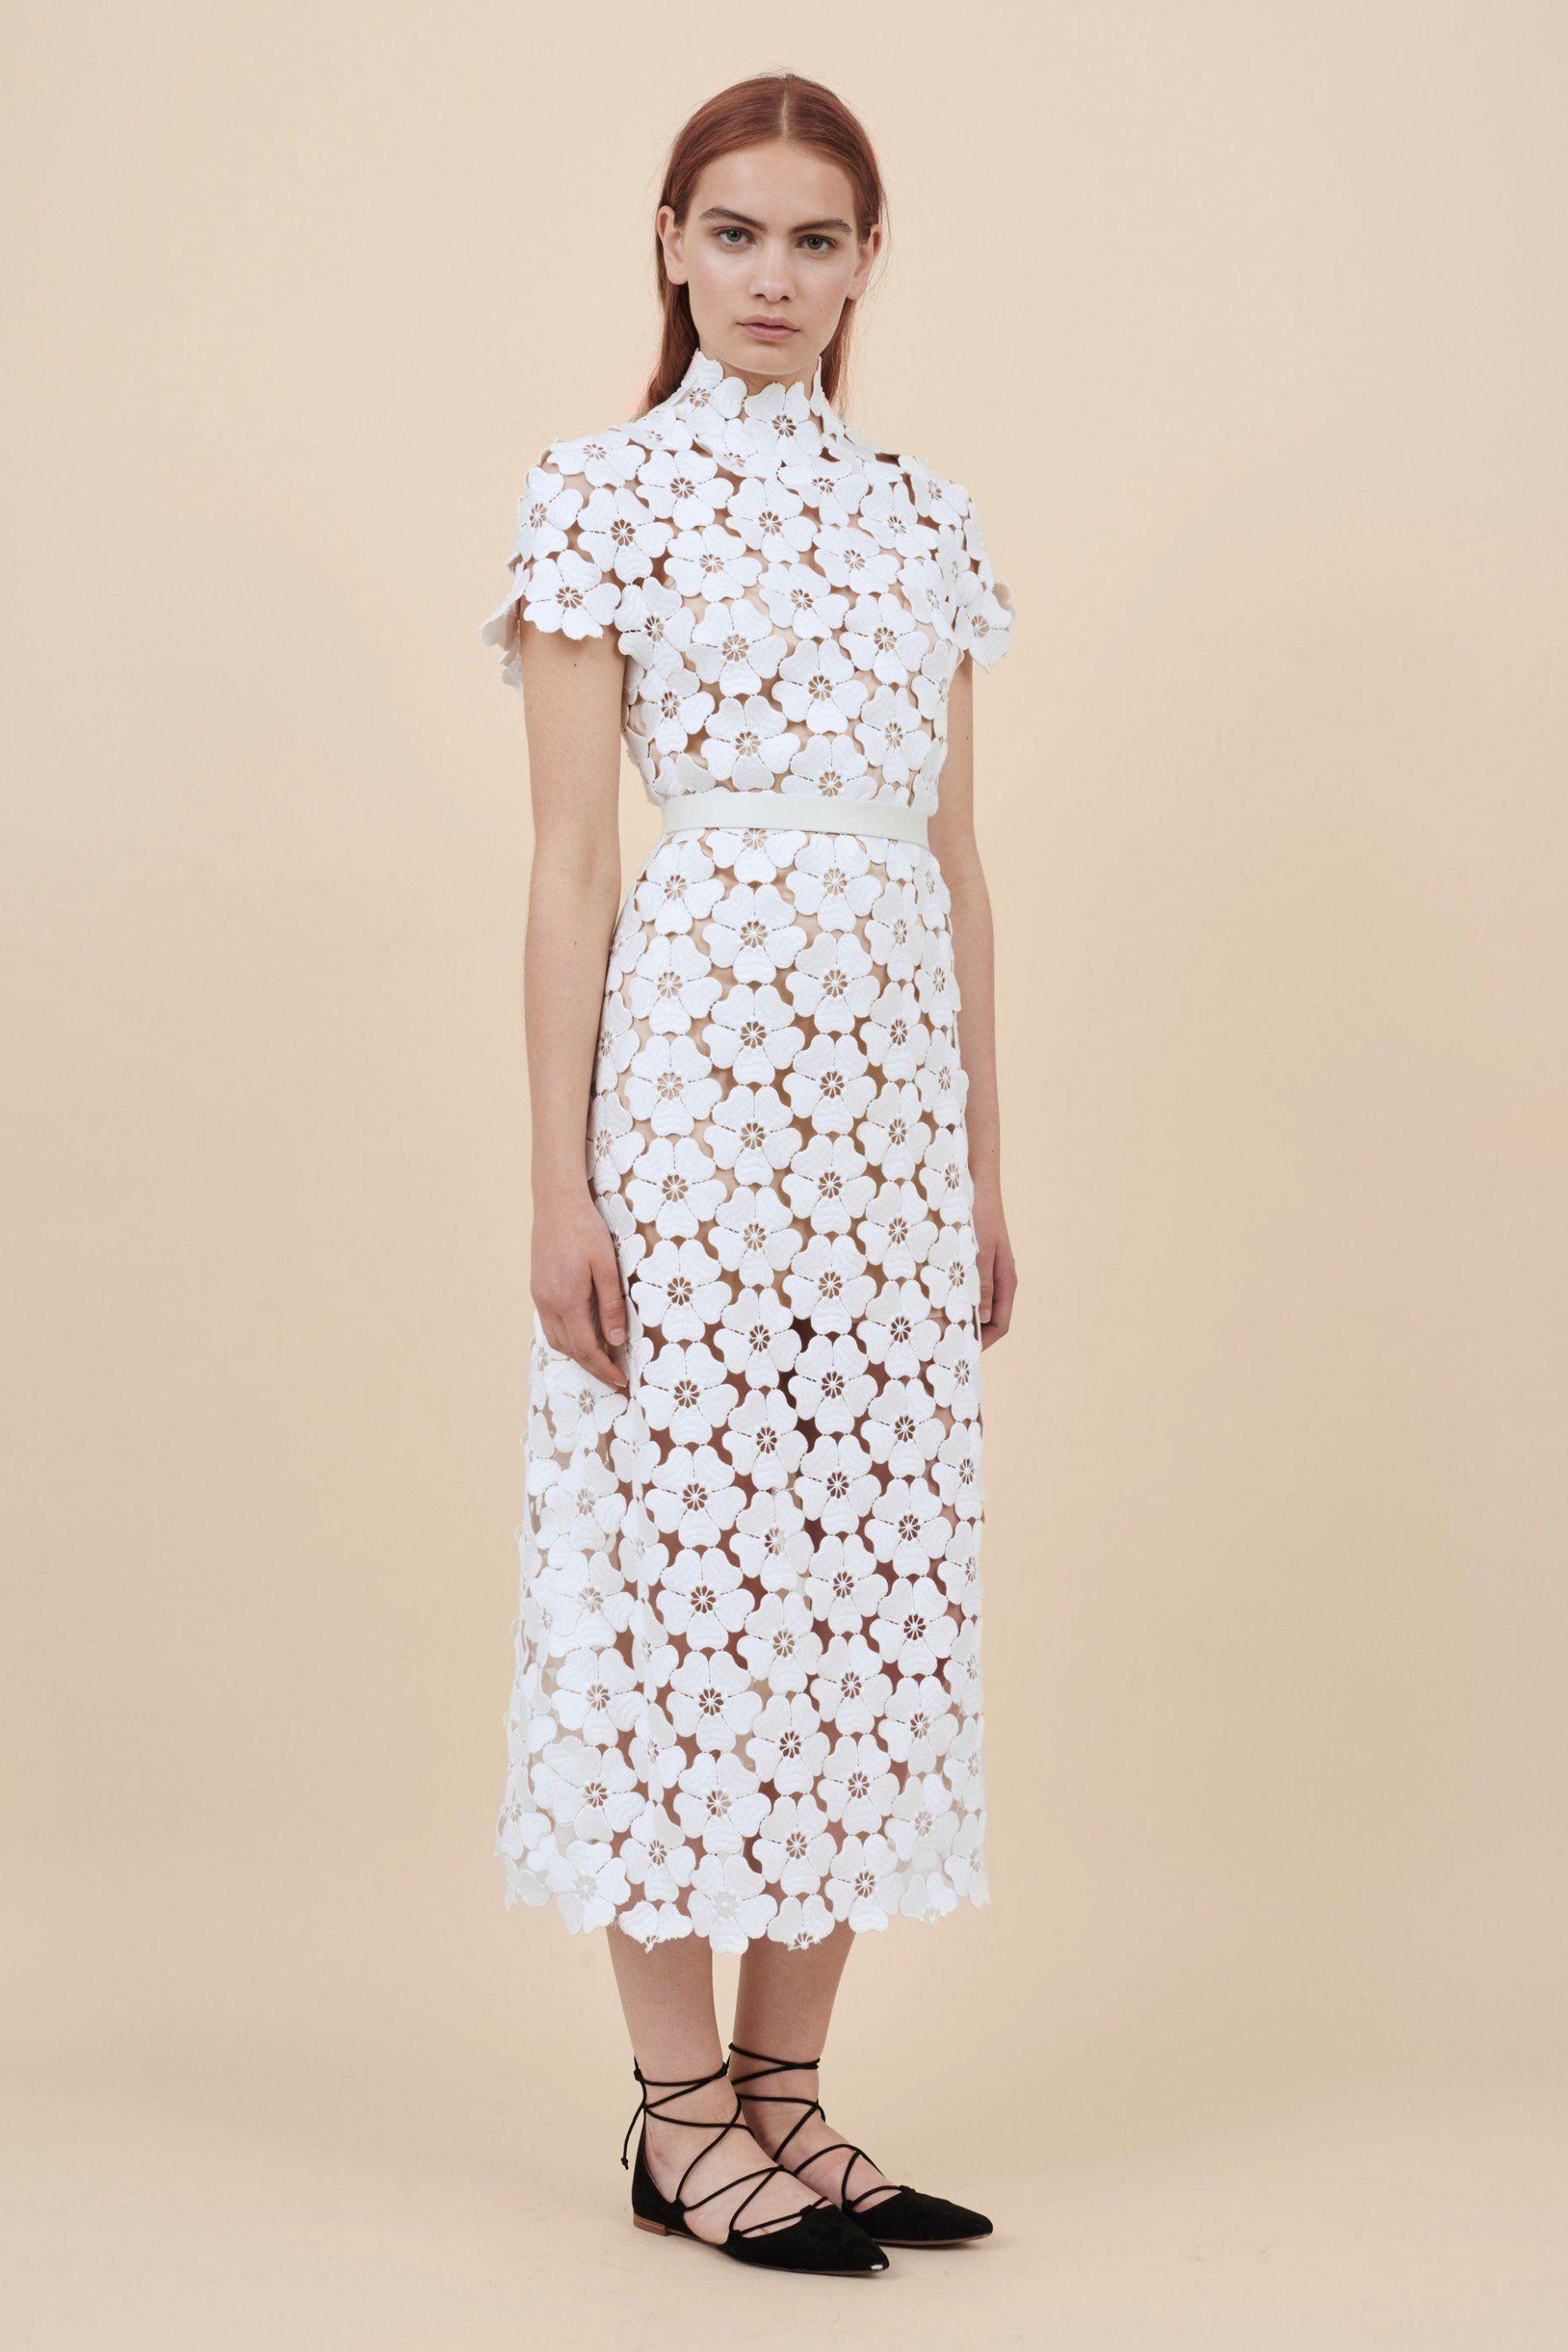 Brautkleid Buttercup Dress Kaviar Gauche Brautkleid Kurze Kleider Modestil